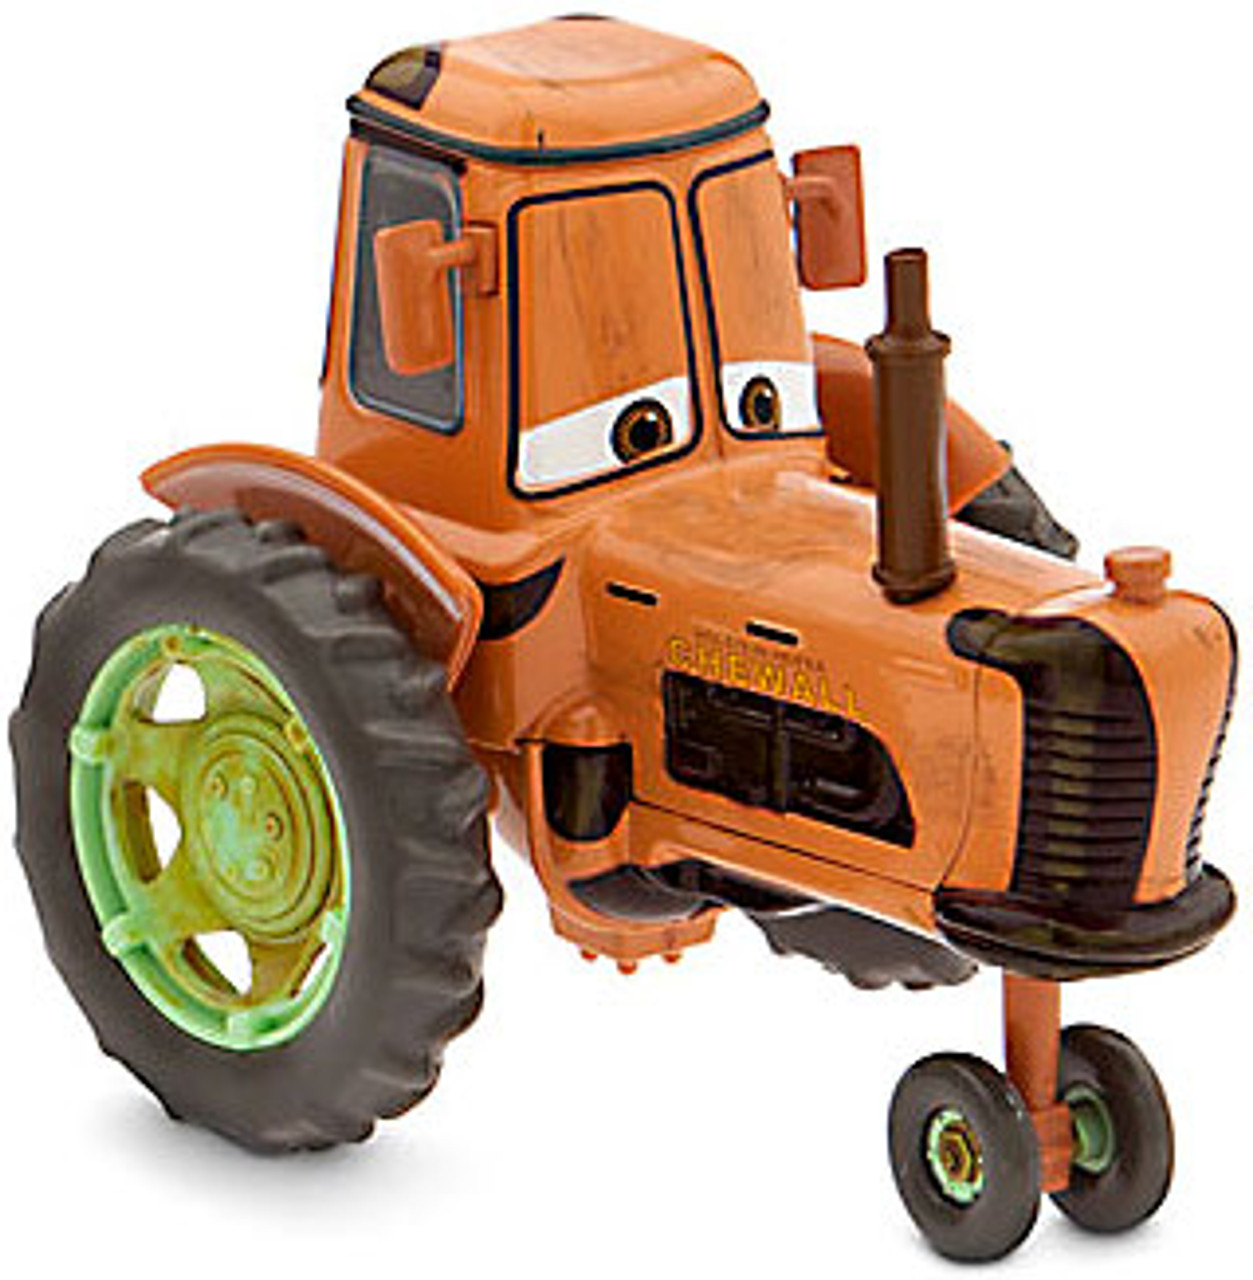 Disney Cars 1:48 Loose Tractor Diecast Car [Loose]